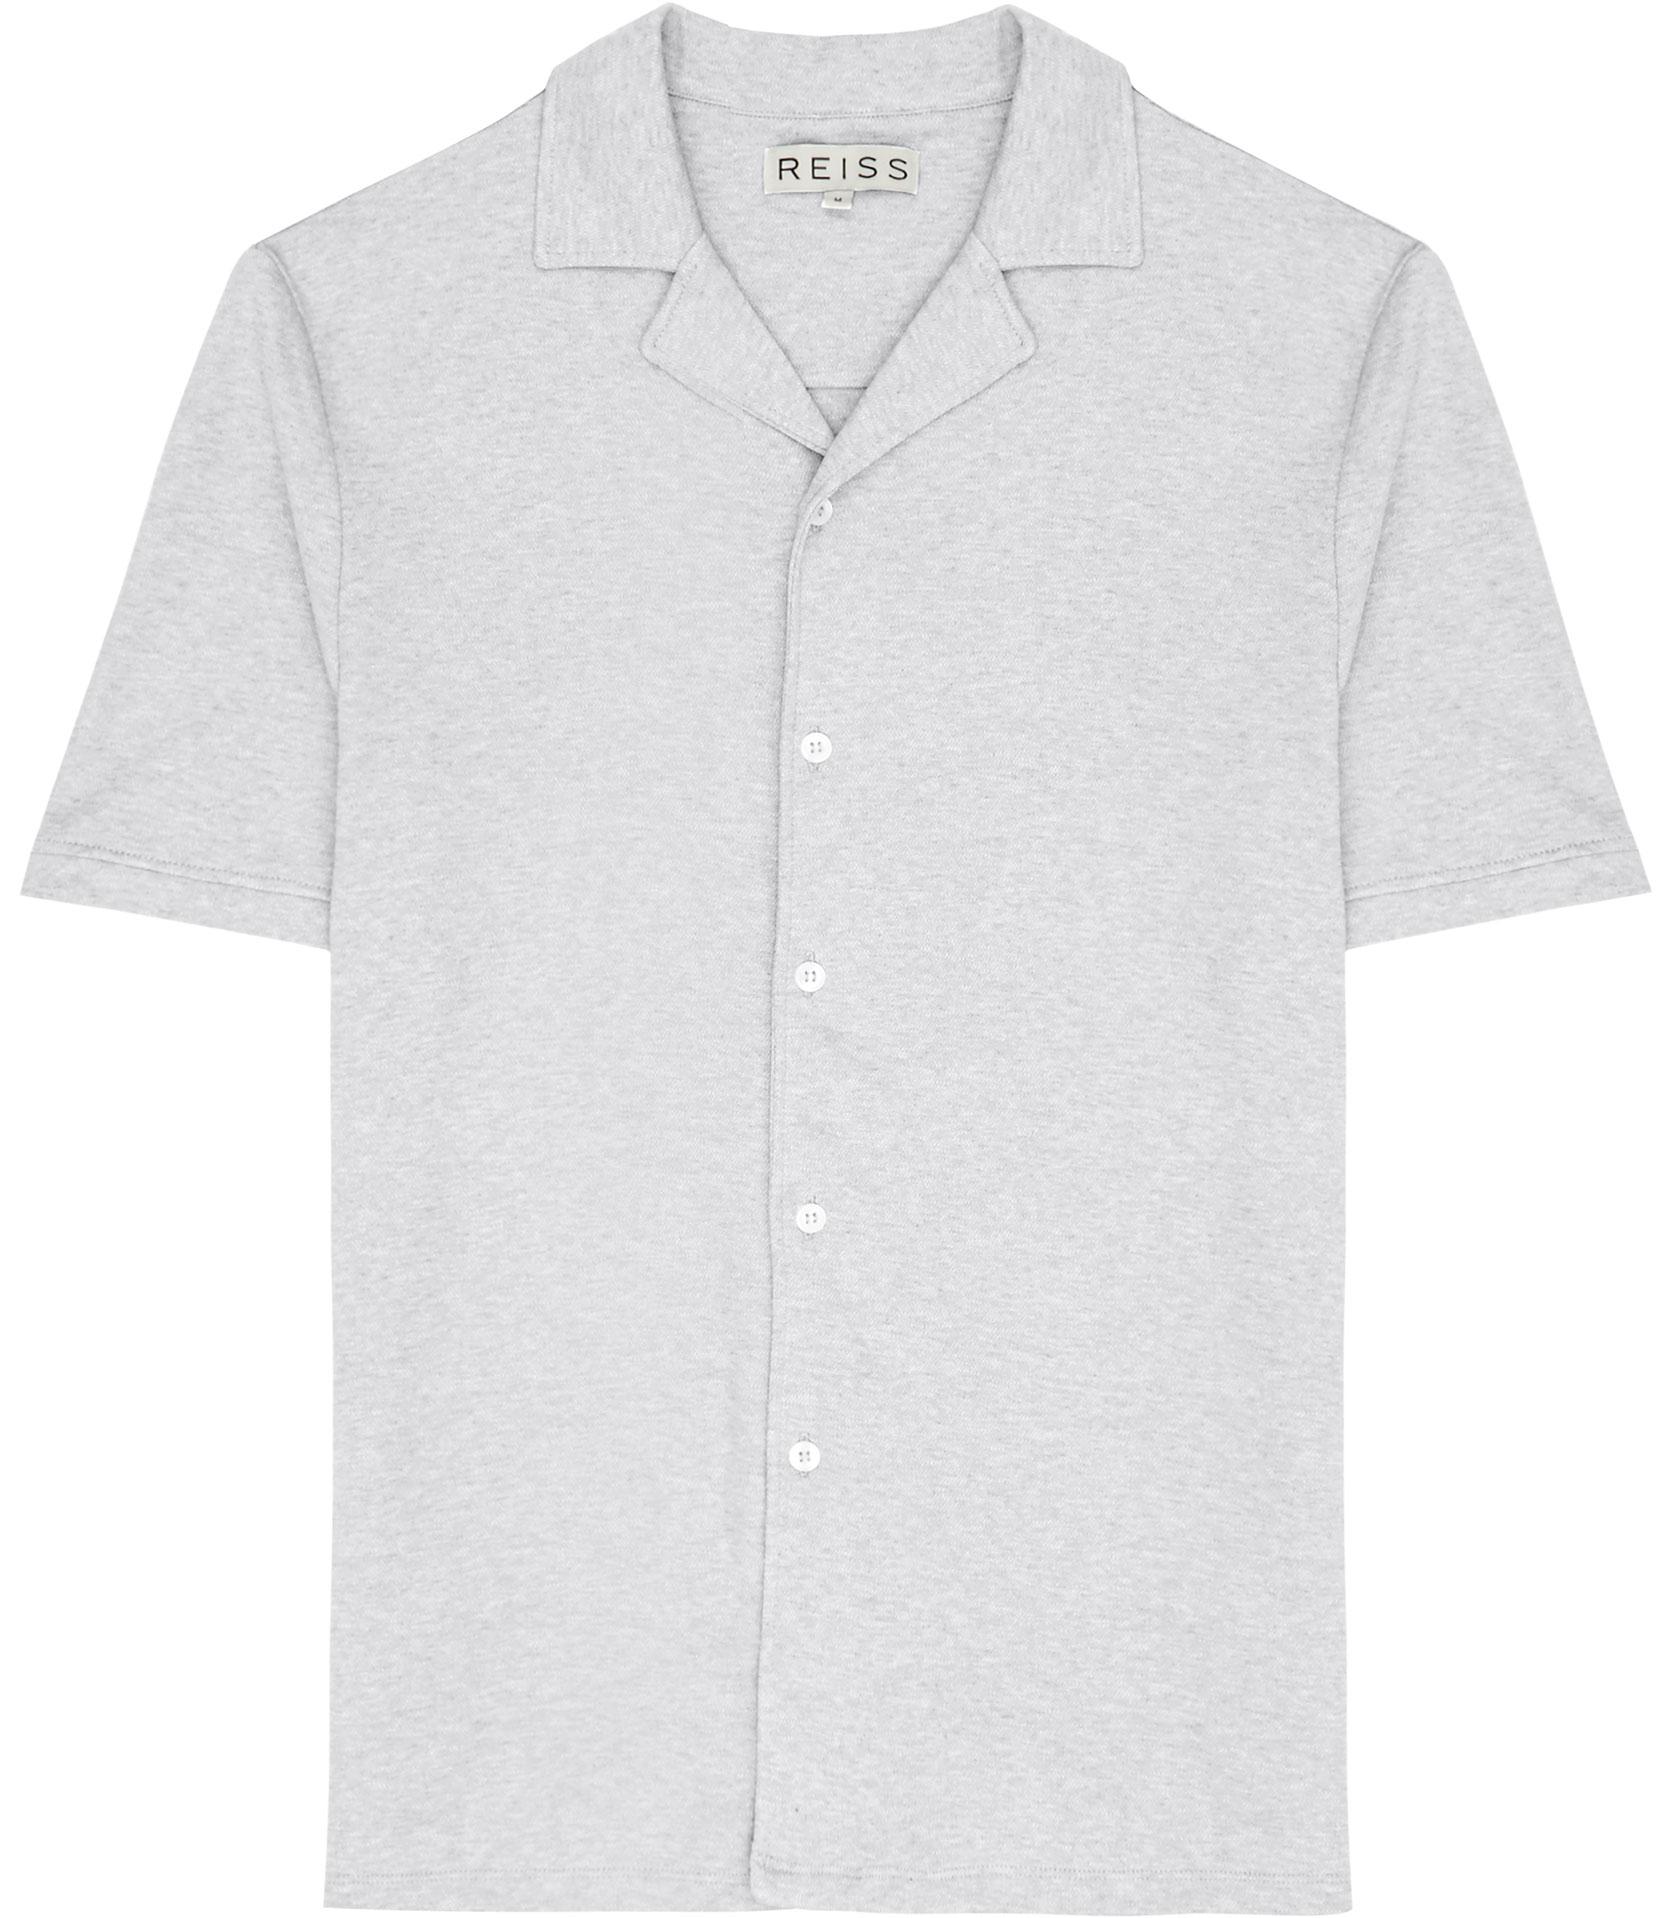 Reiss Antonio Cuban Collar Shirt In White For Men Lyst